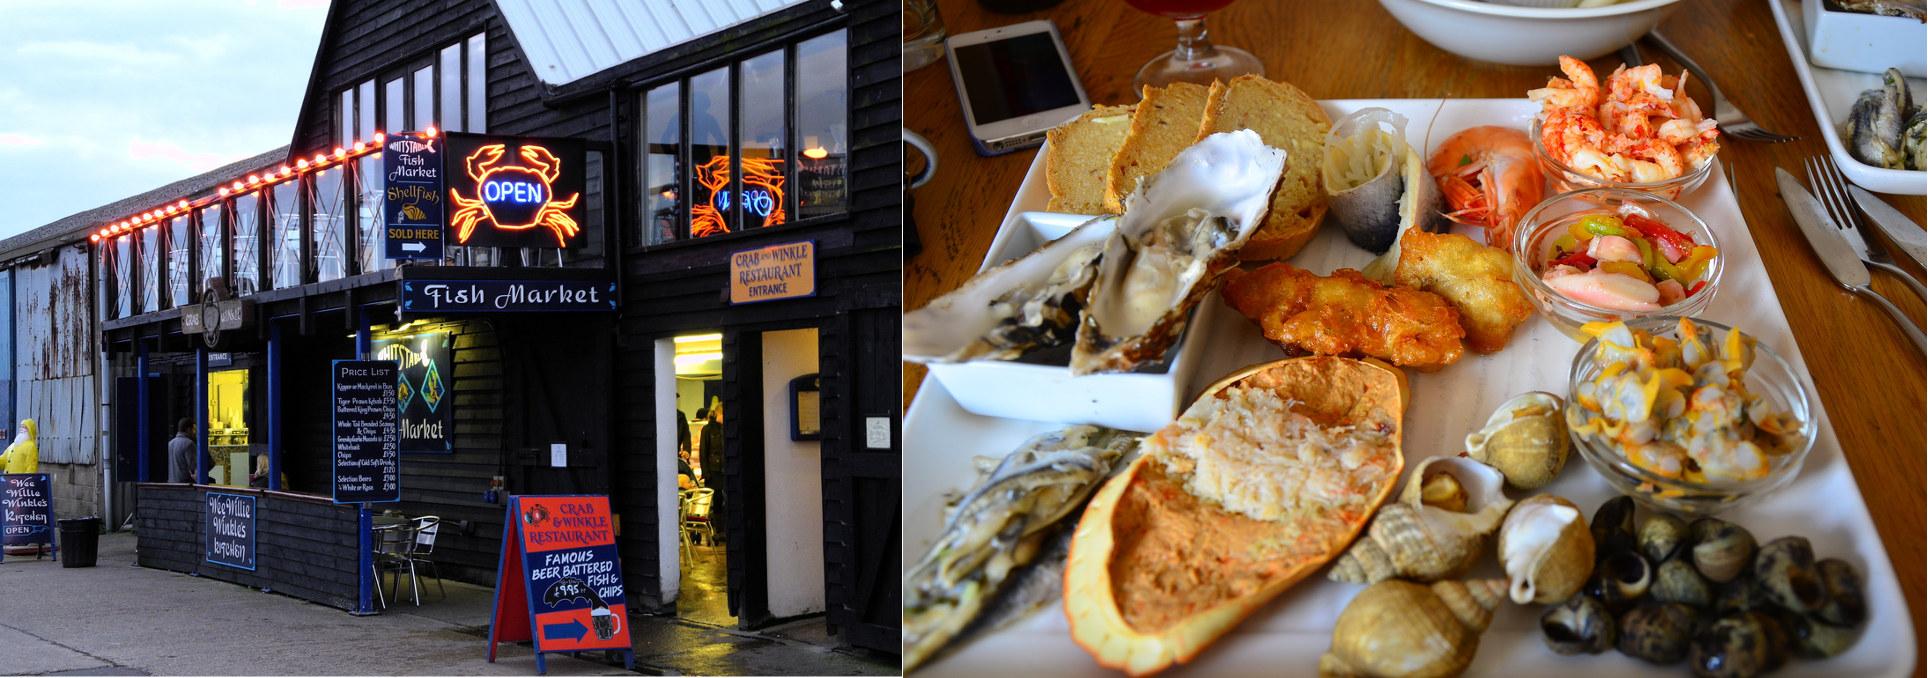 Crab-Winkle-Fish-restaurant-whitstable